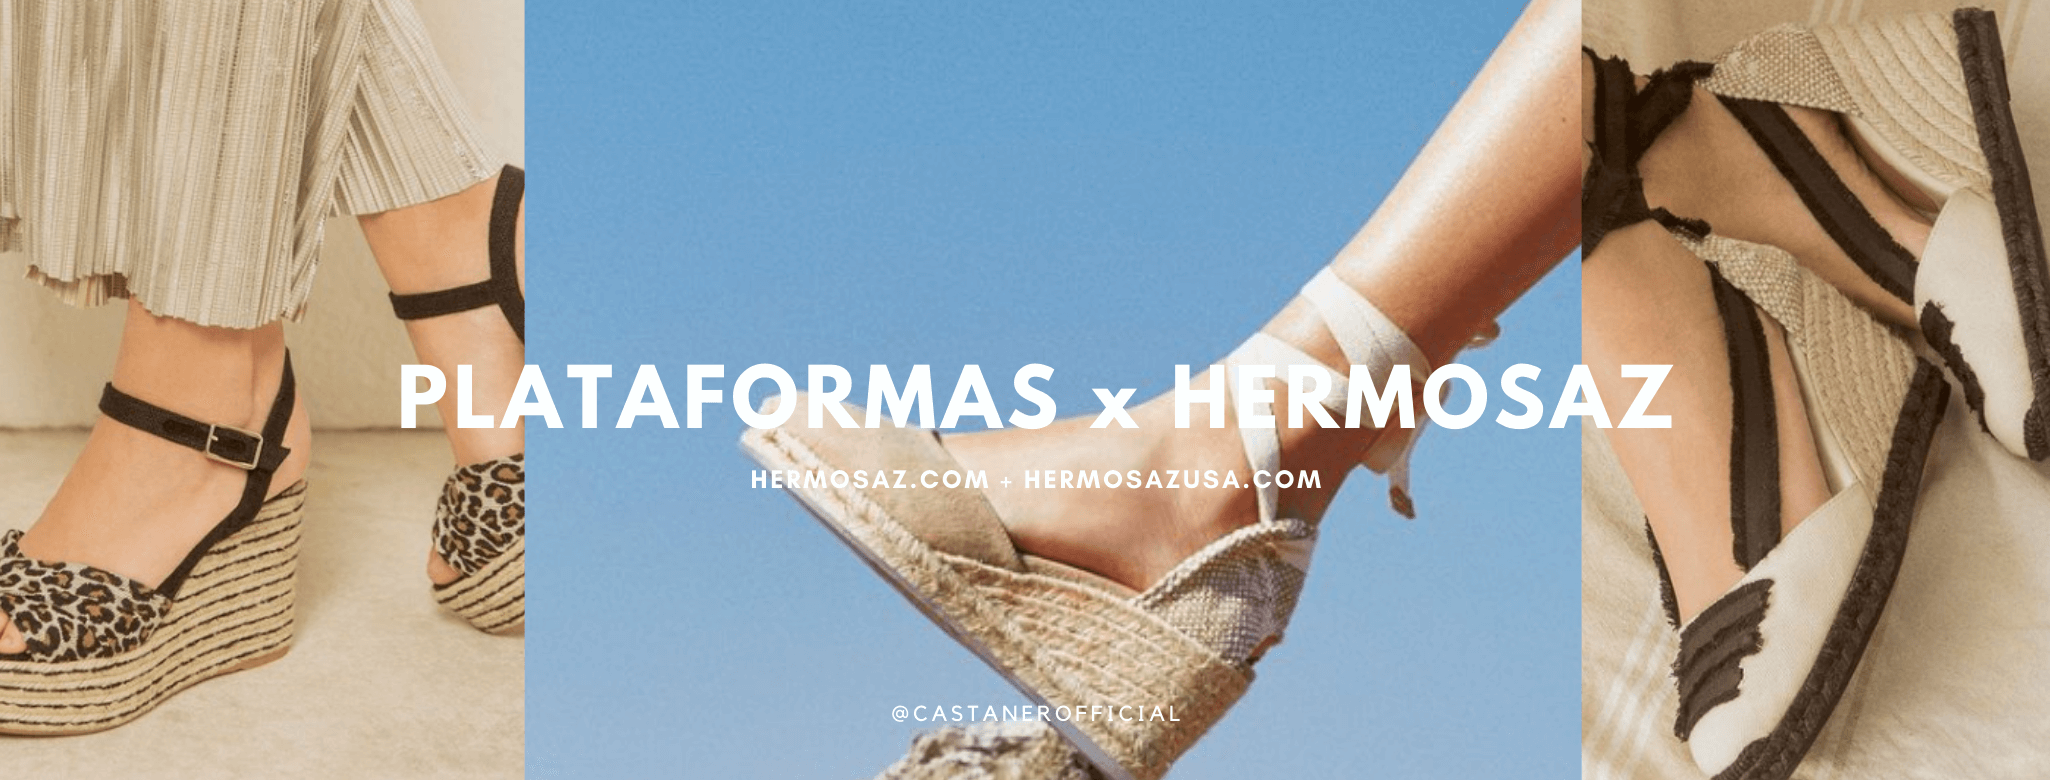 Plataformas x Hermosaz